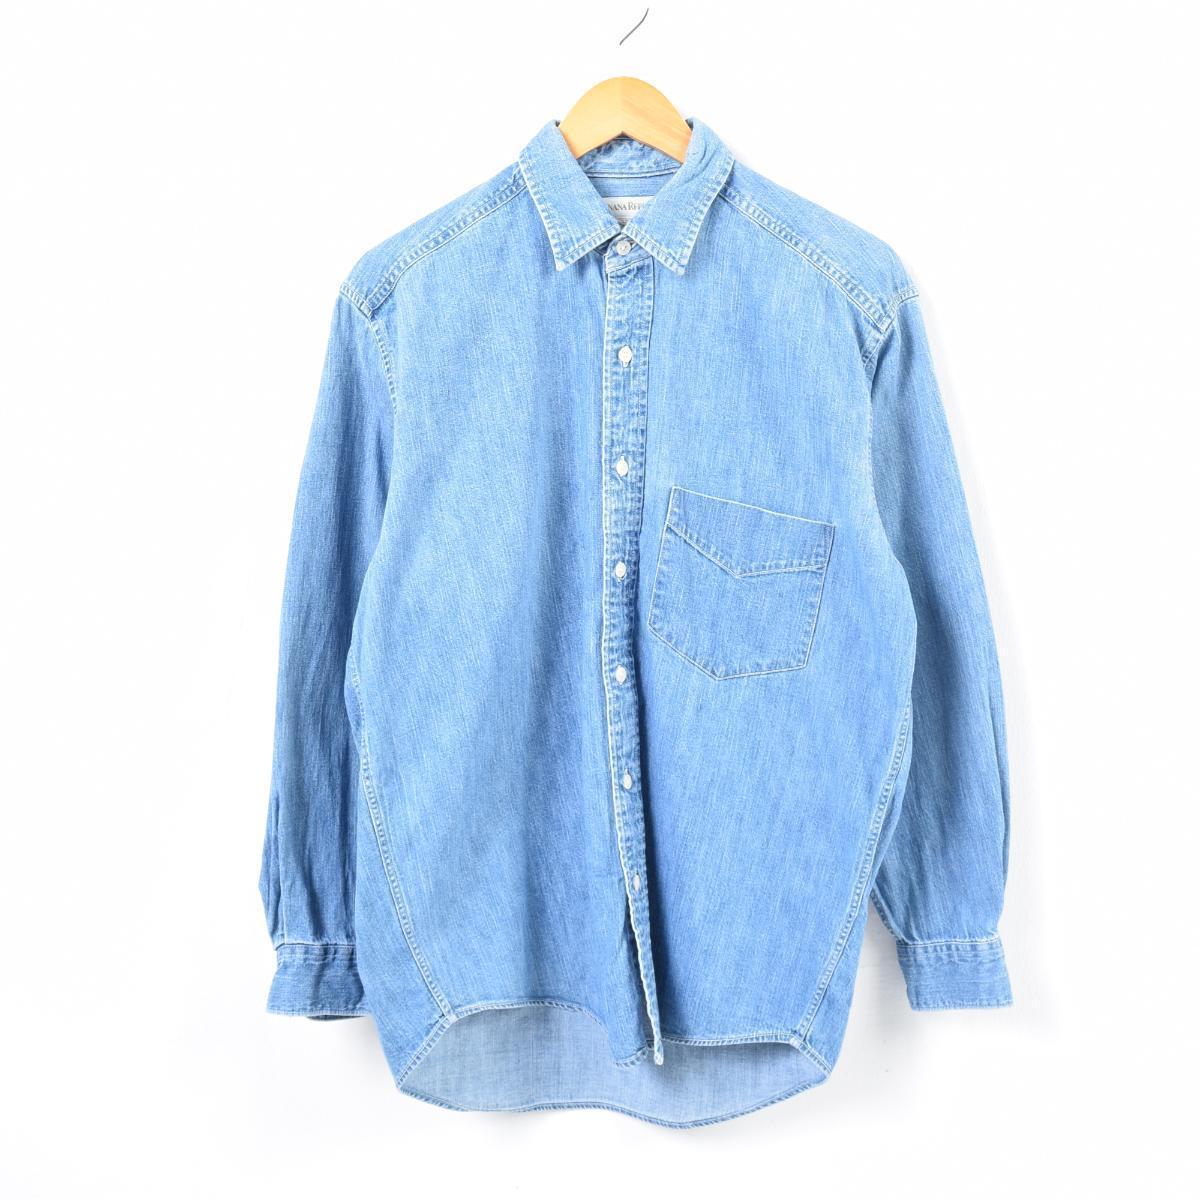 5c10d5c9ec 90s banana republic BANANA REPUBLIC back print long sleeves denim shirt men  M  war6515